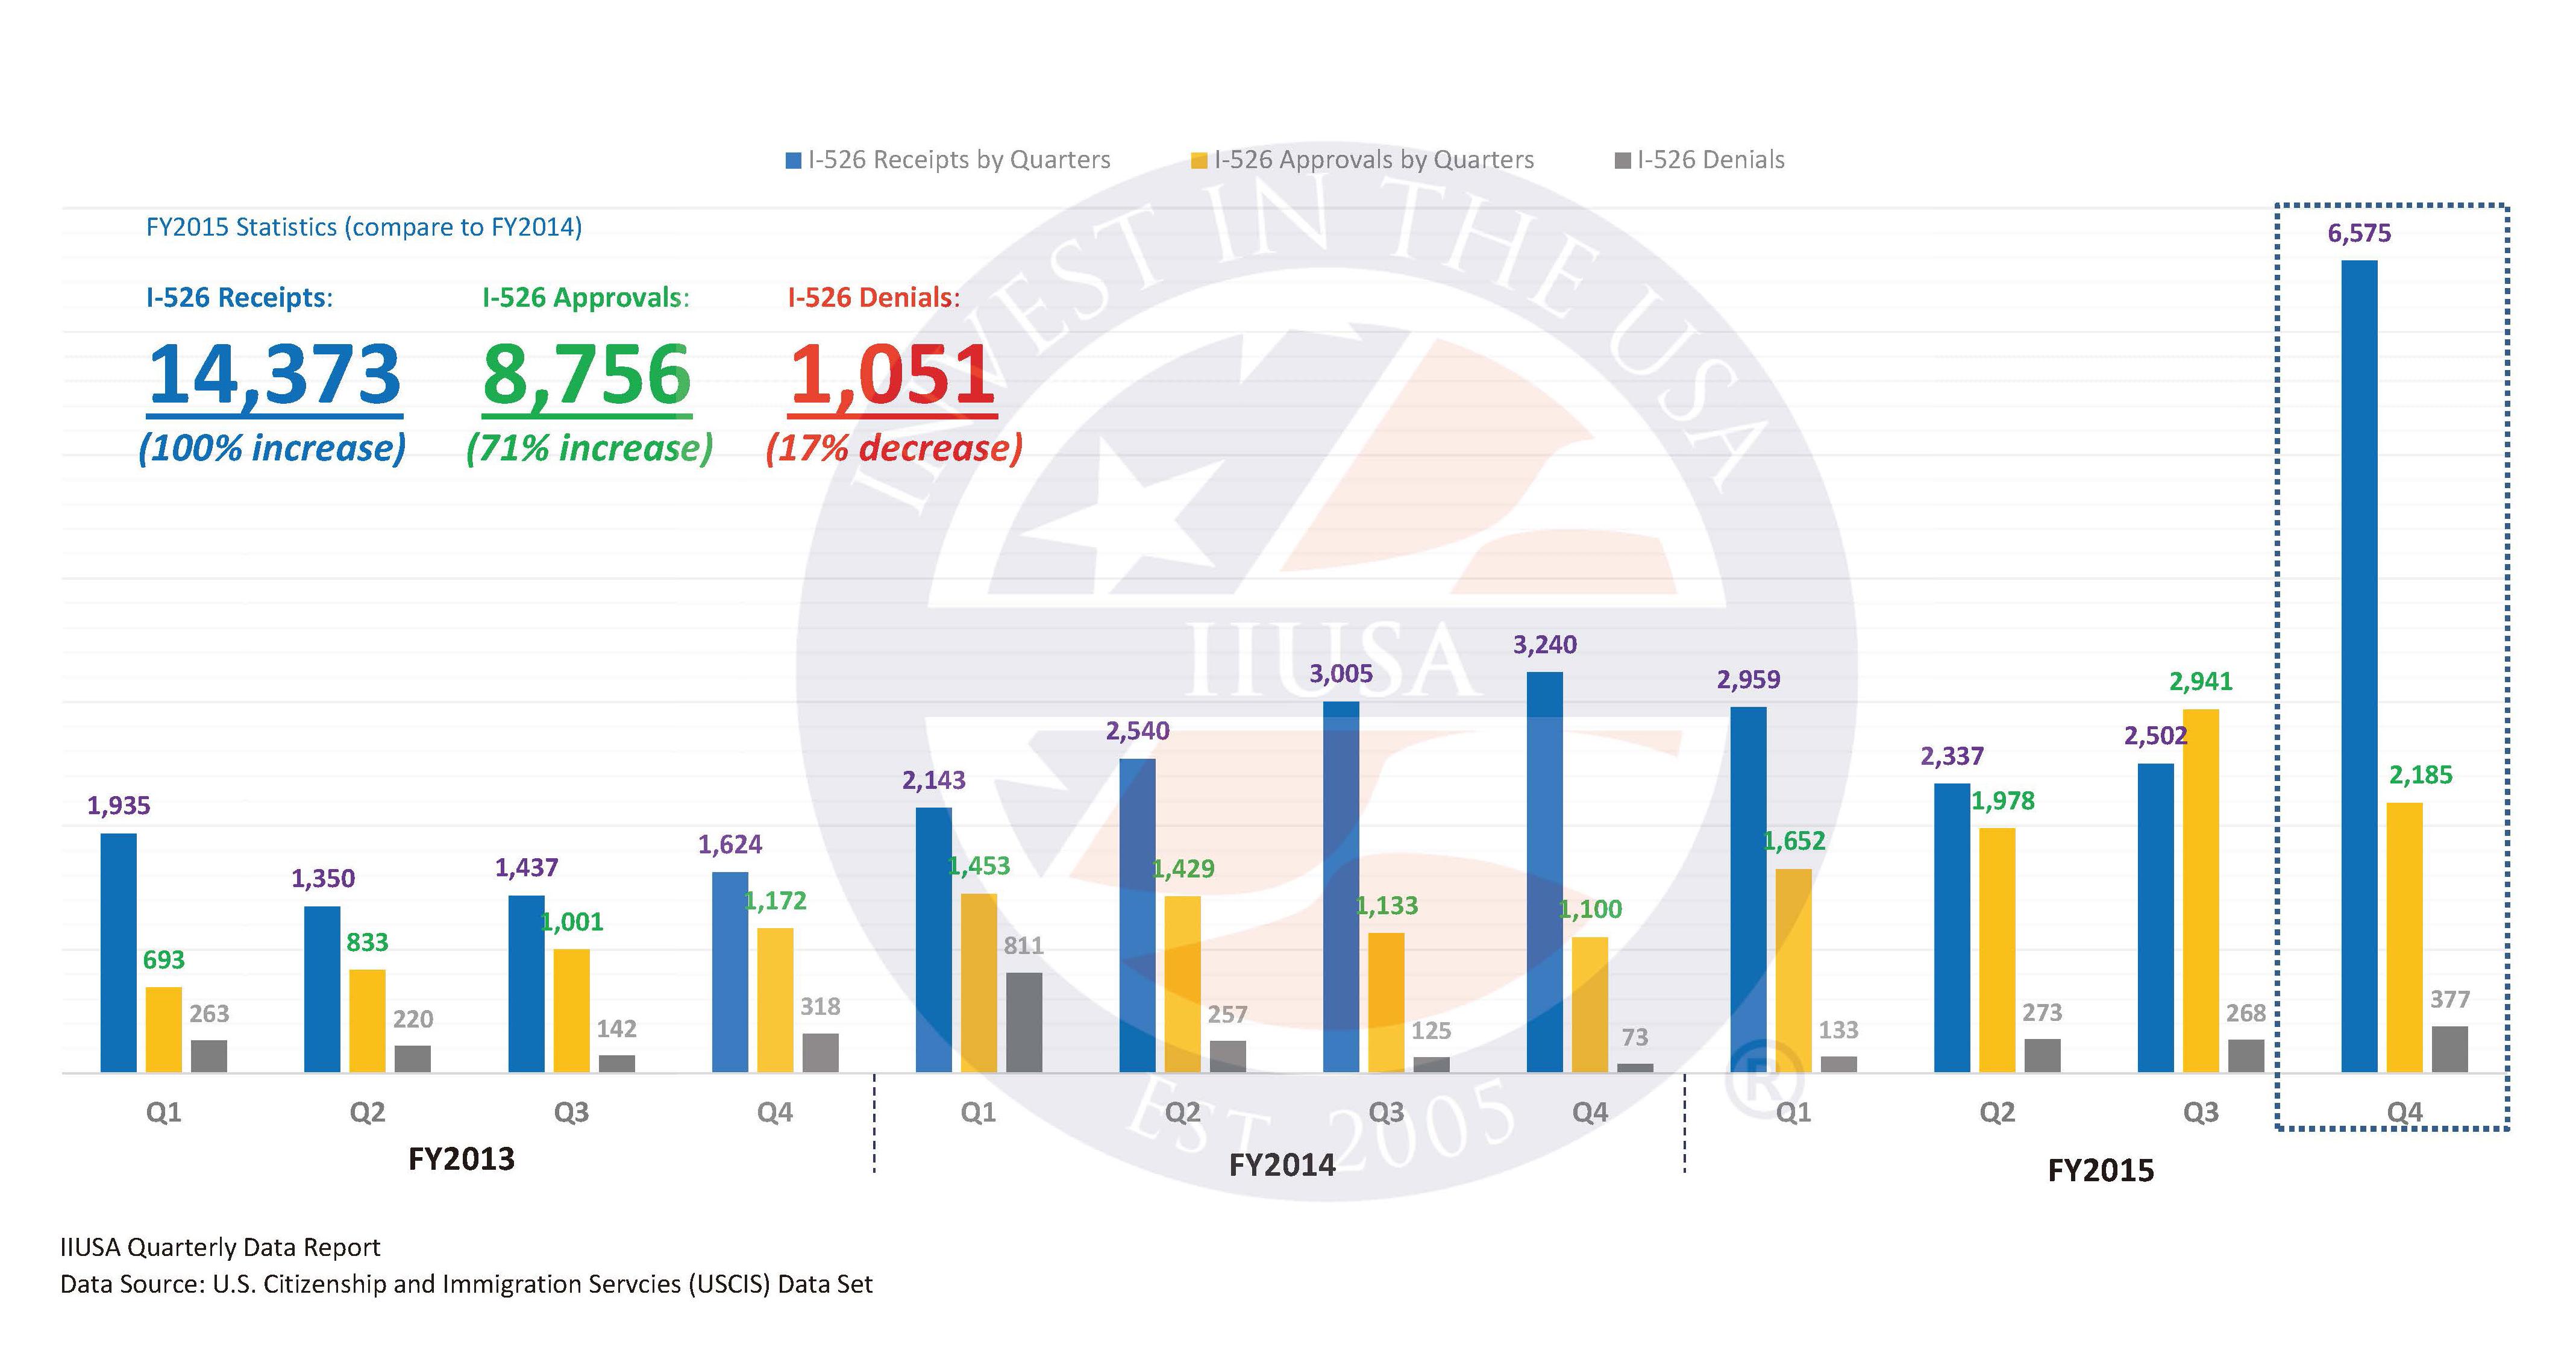 IIUSA Data Report: USCIS Publishes 2015 Q4 Adjudication Statistics Providing EB-5 Stakeholders with Full Year Program Data